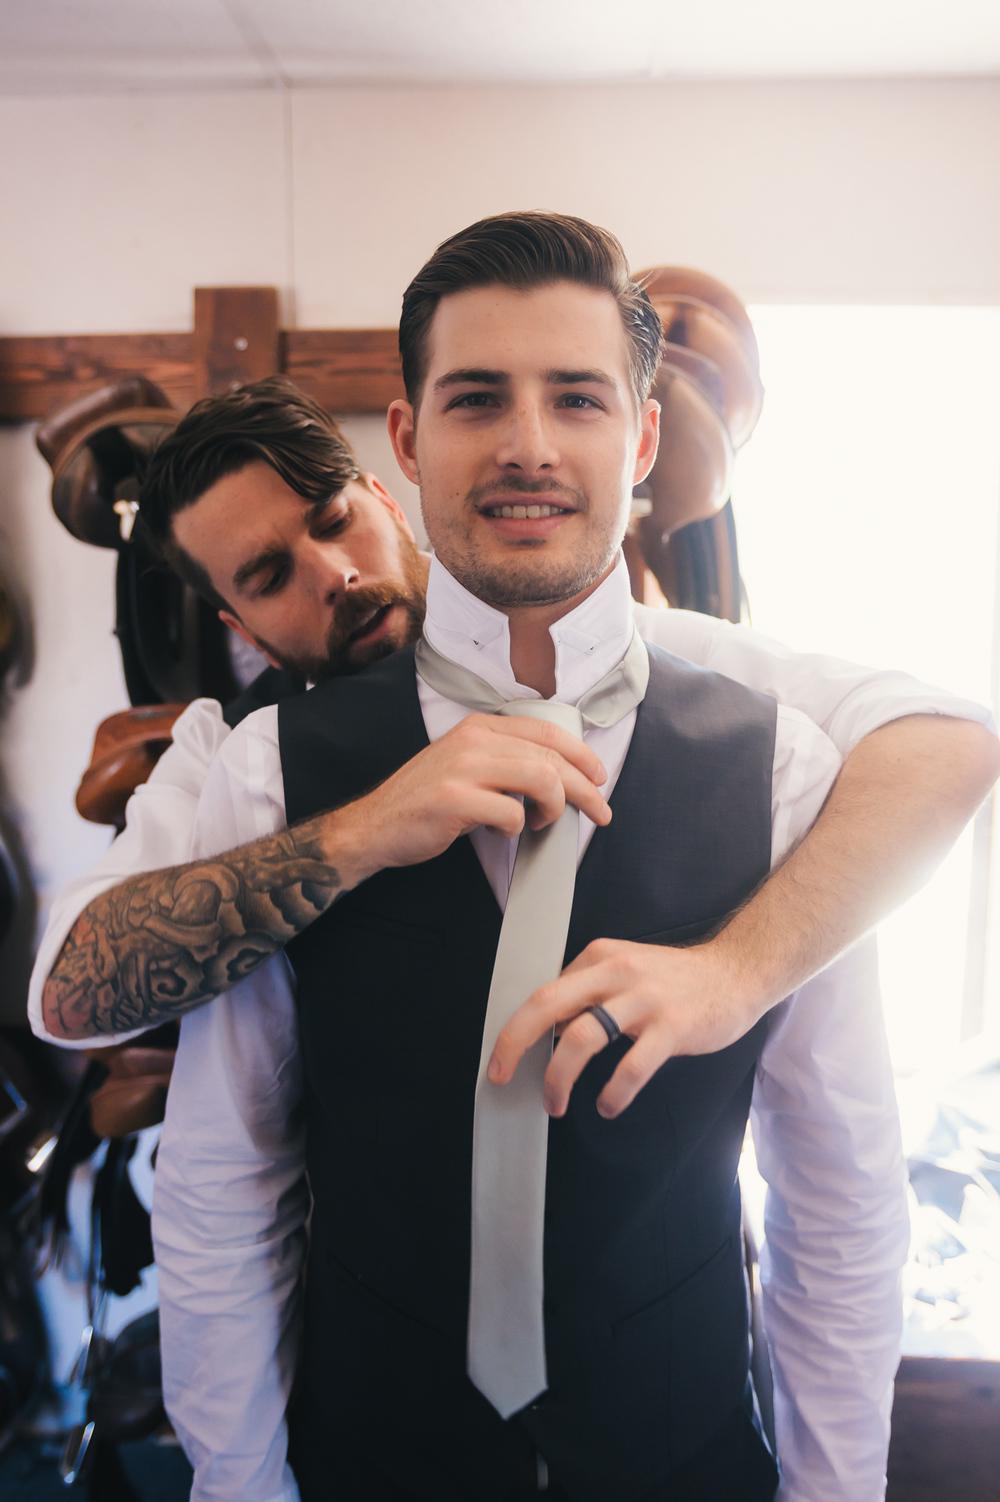 Los Angeles Wedding Photography-6.jpg